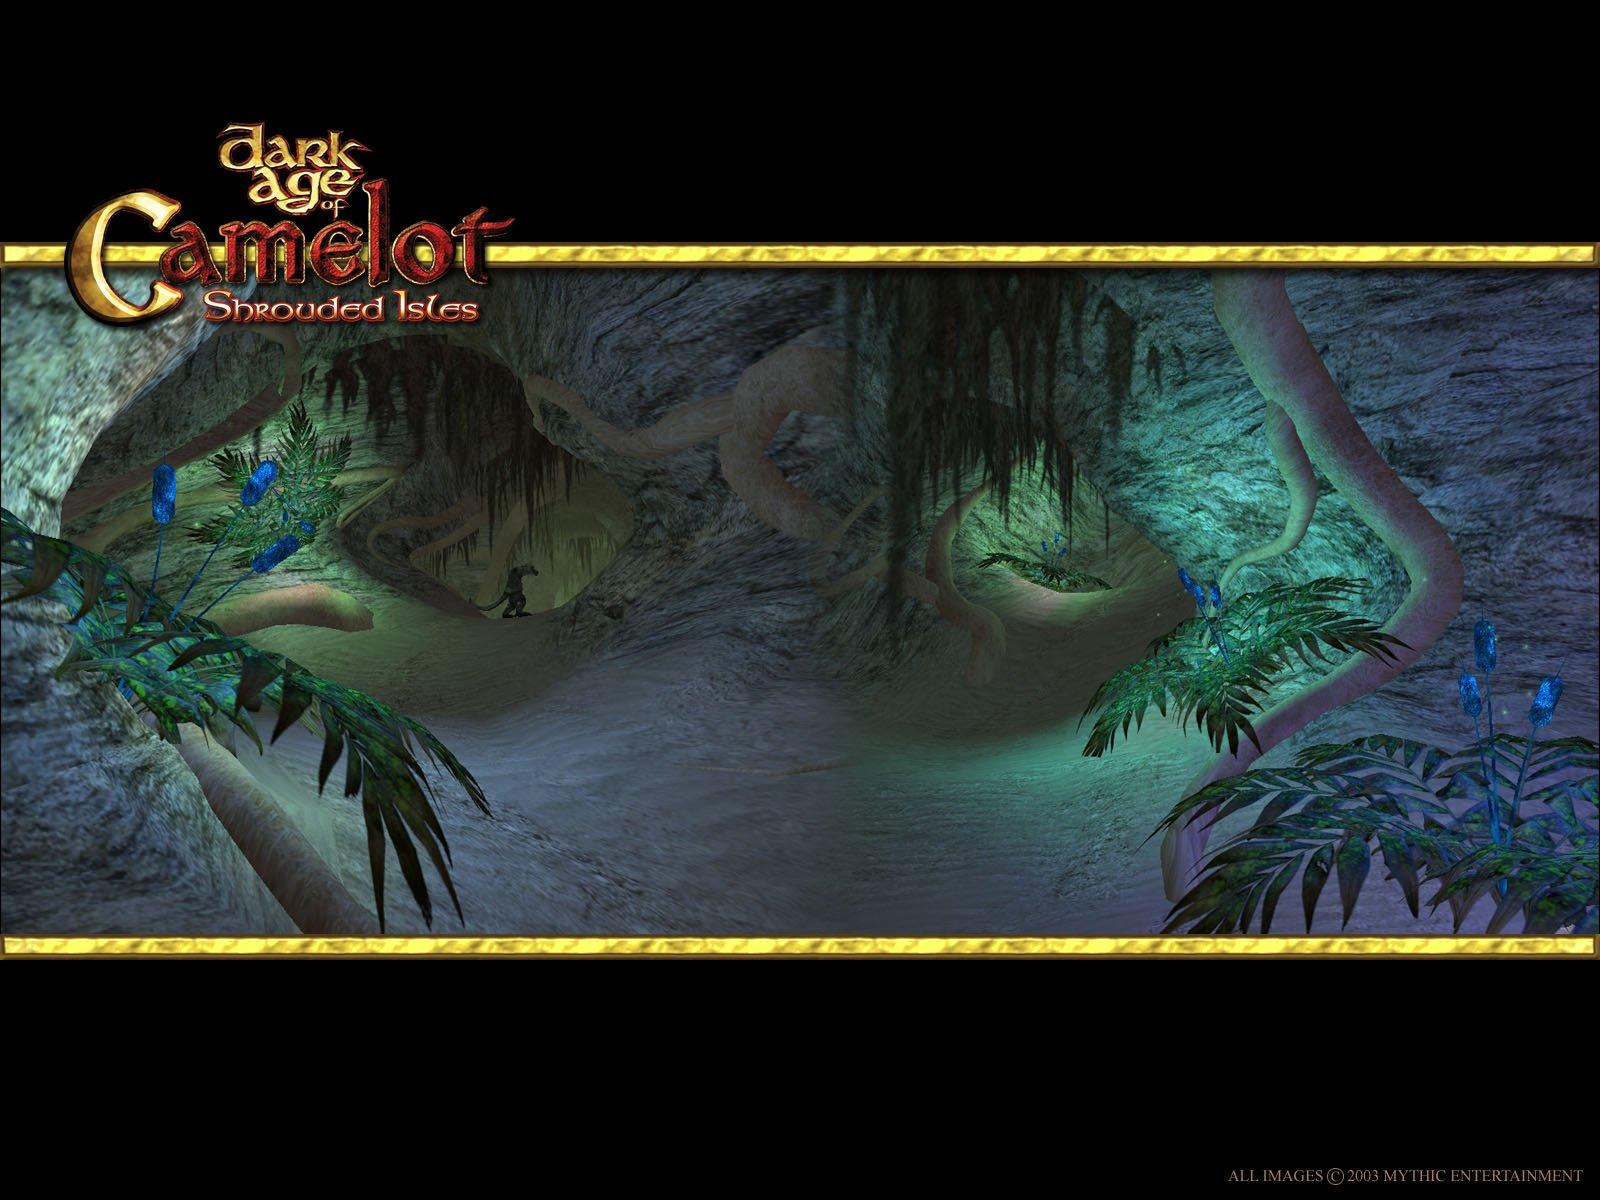 Dark Age Camelot Rpg Mmo Fantasy Action Fighting Medieval Online